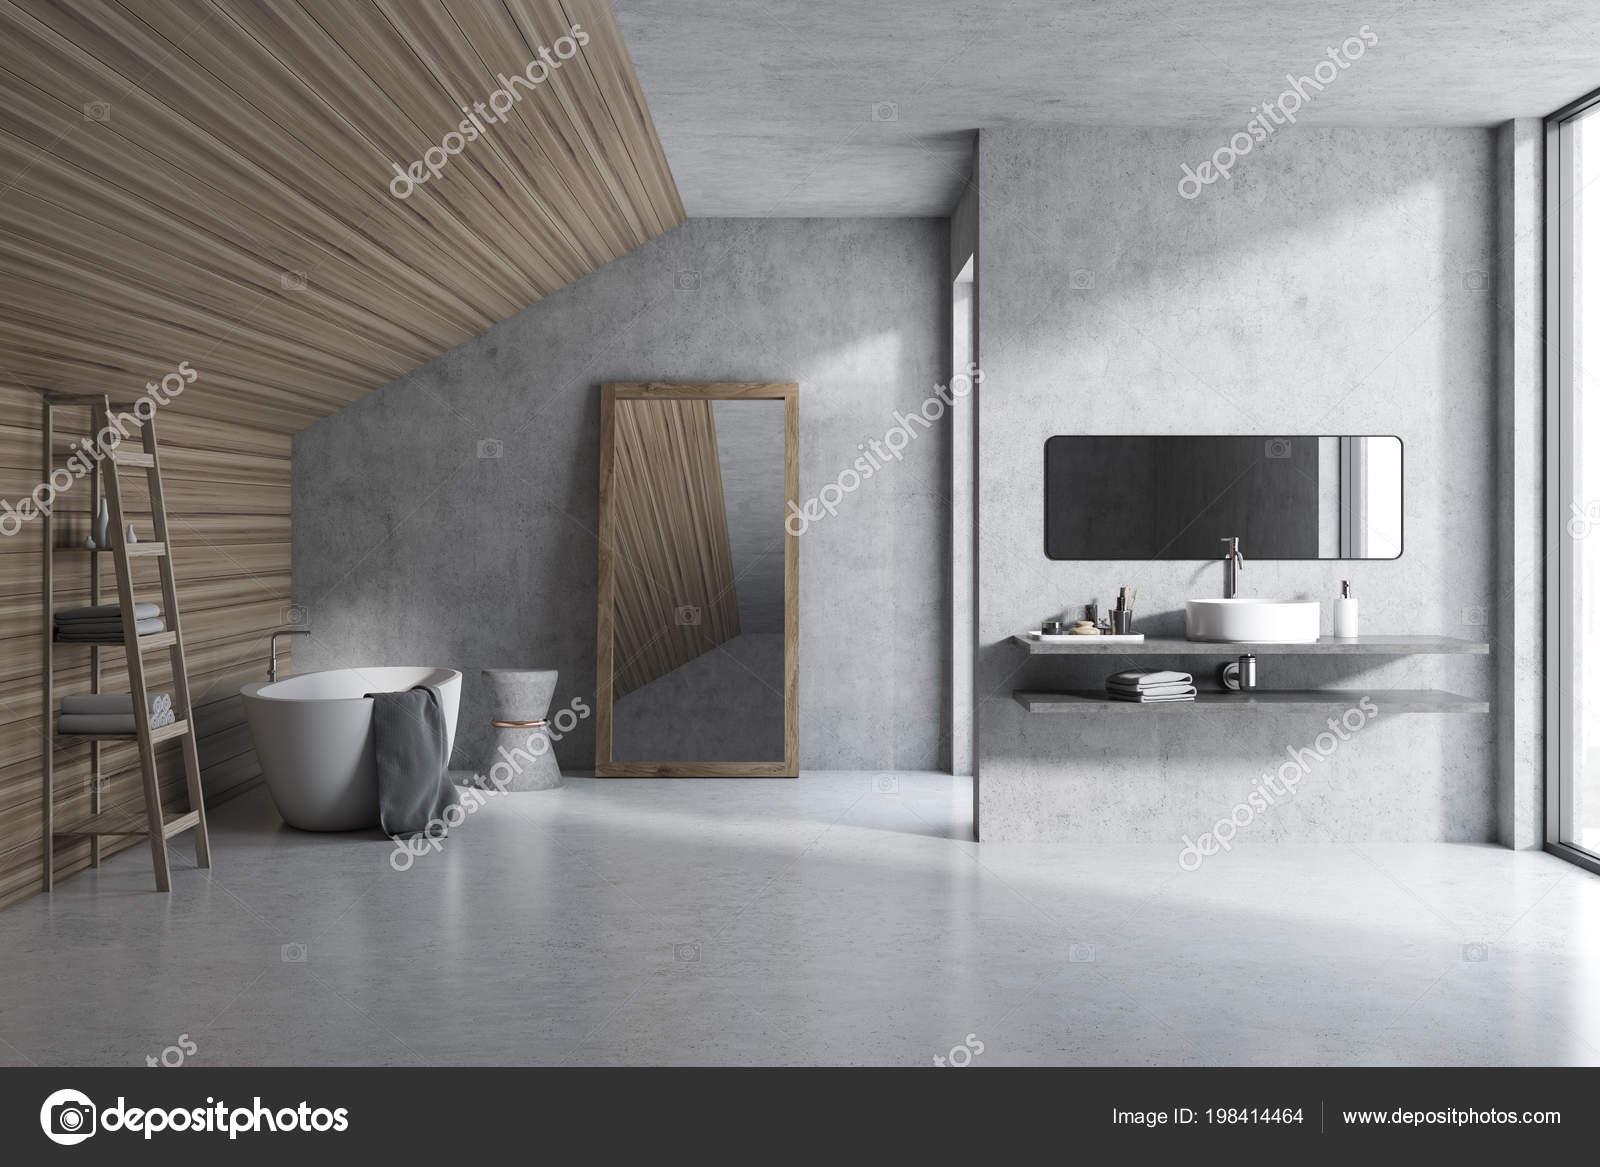 Charmant Attic Bathroom Interior Concrete Wooden Walls Concrete Floor Shower Stall U2014  Stock Photo